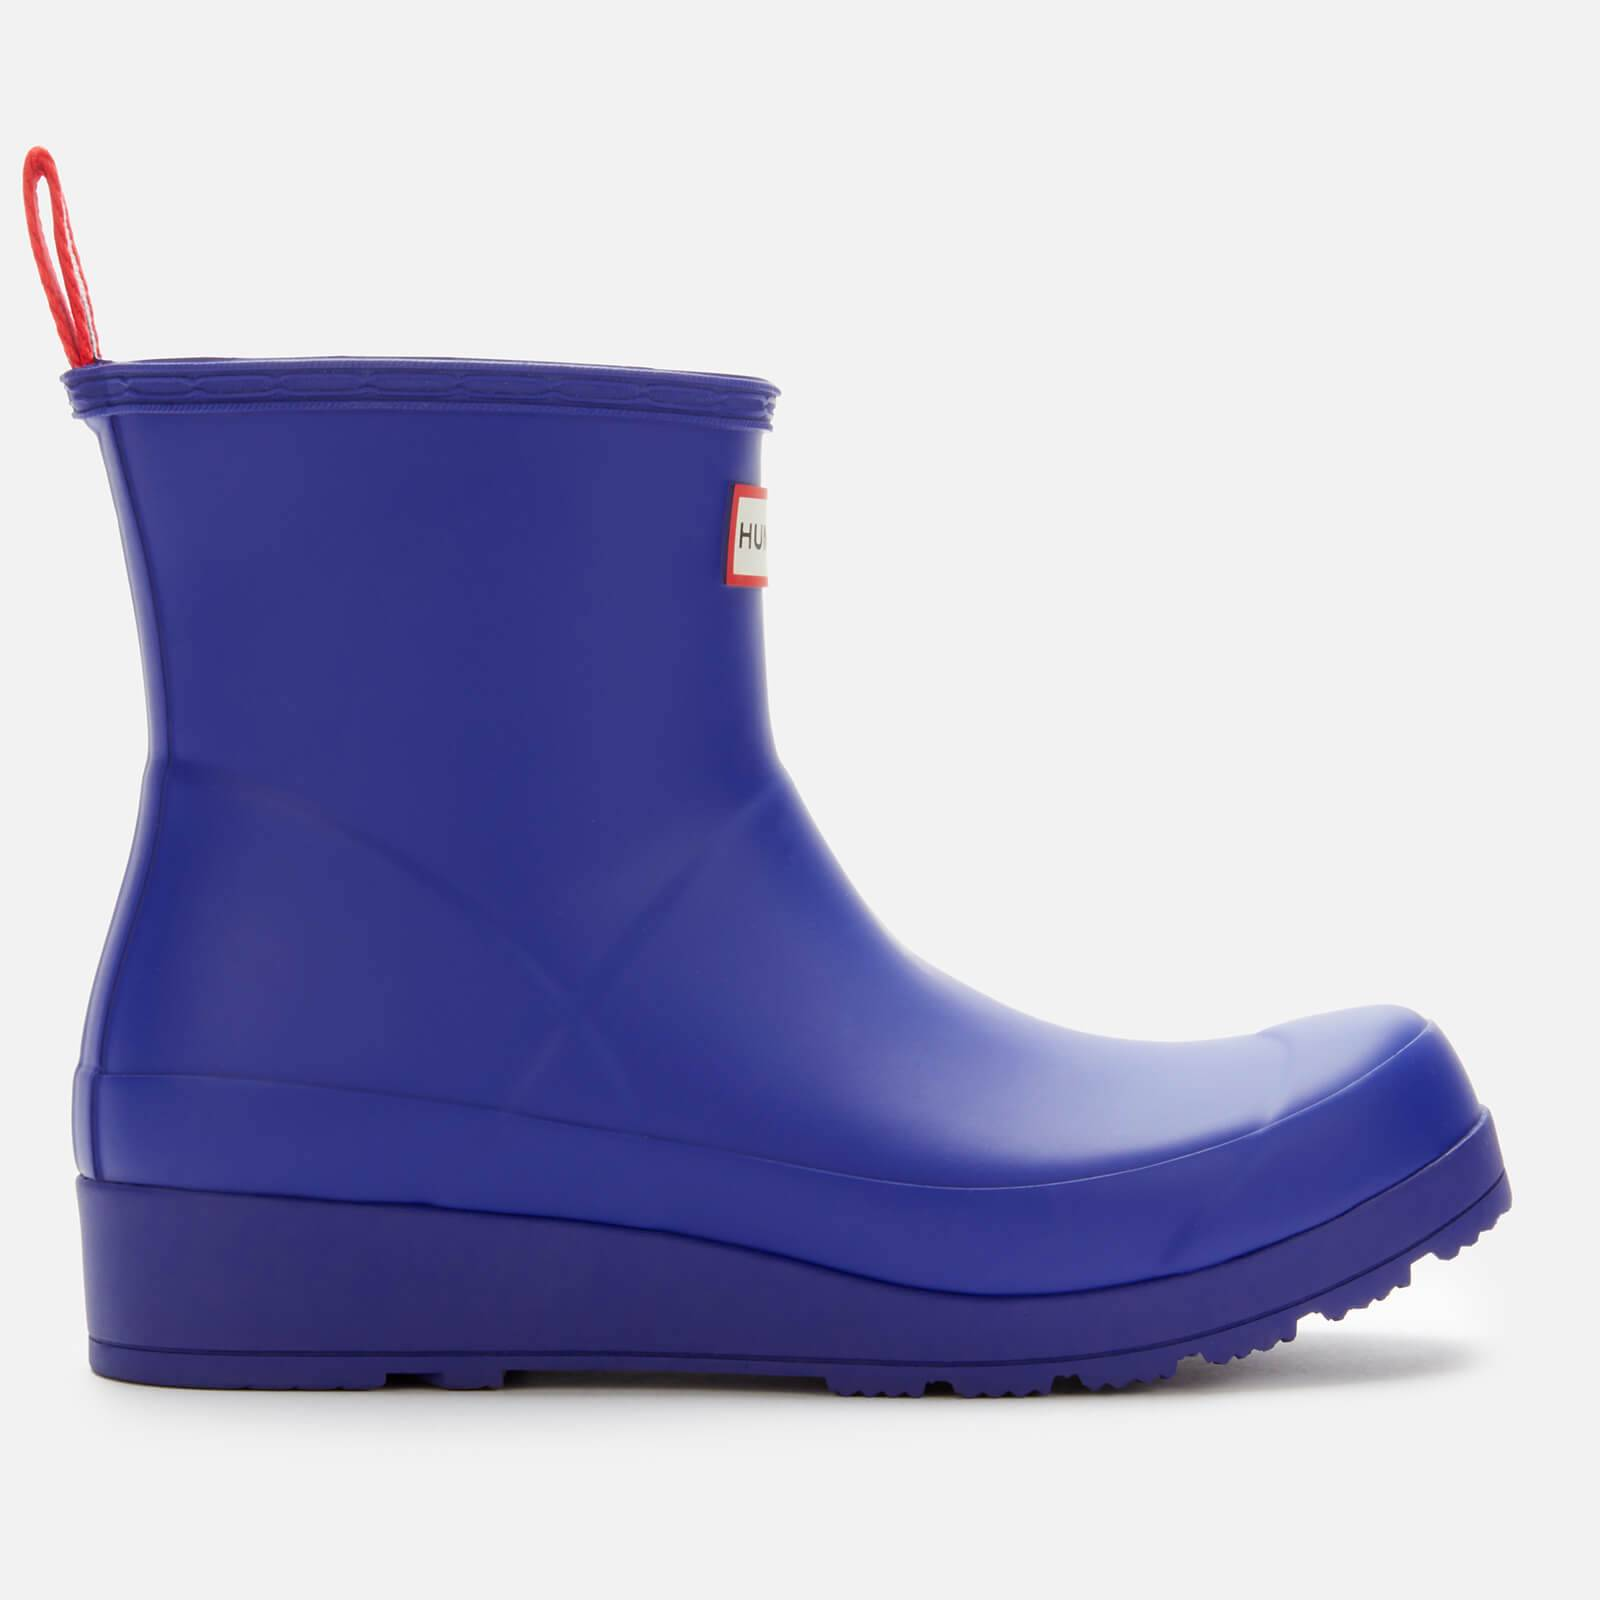 Hunter Women's Original Play Short Boots - Electric Storm - UK 5